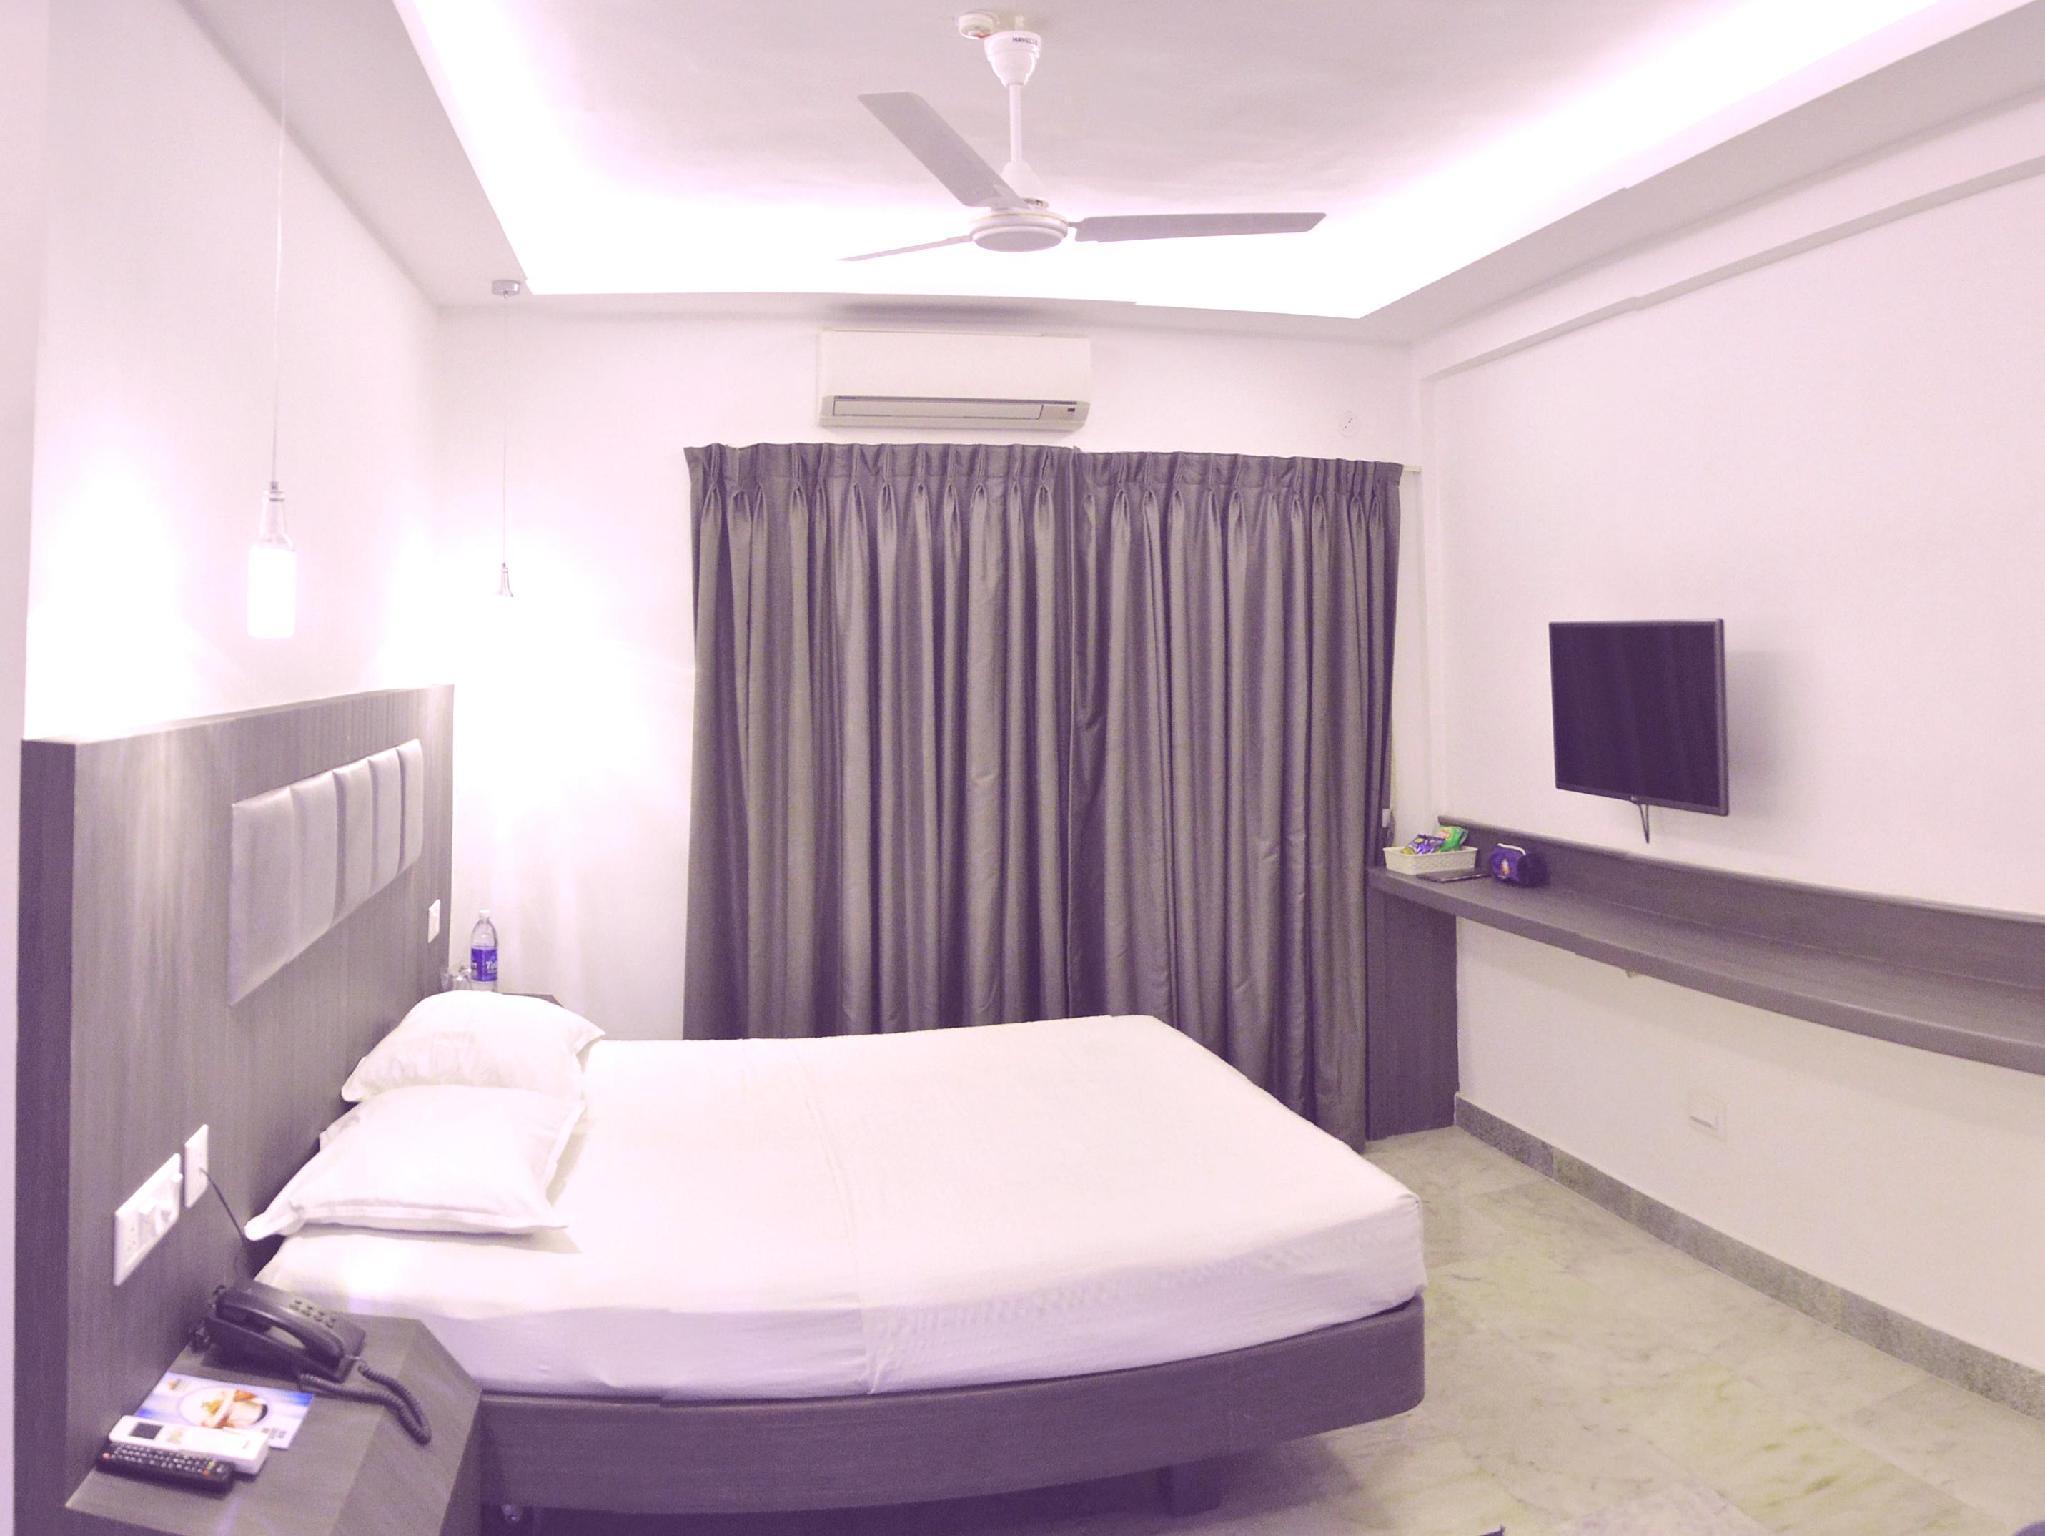 Mamalla heritage mamallapuram hotel chennai Рoffres sp̩ciales ...